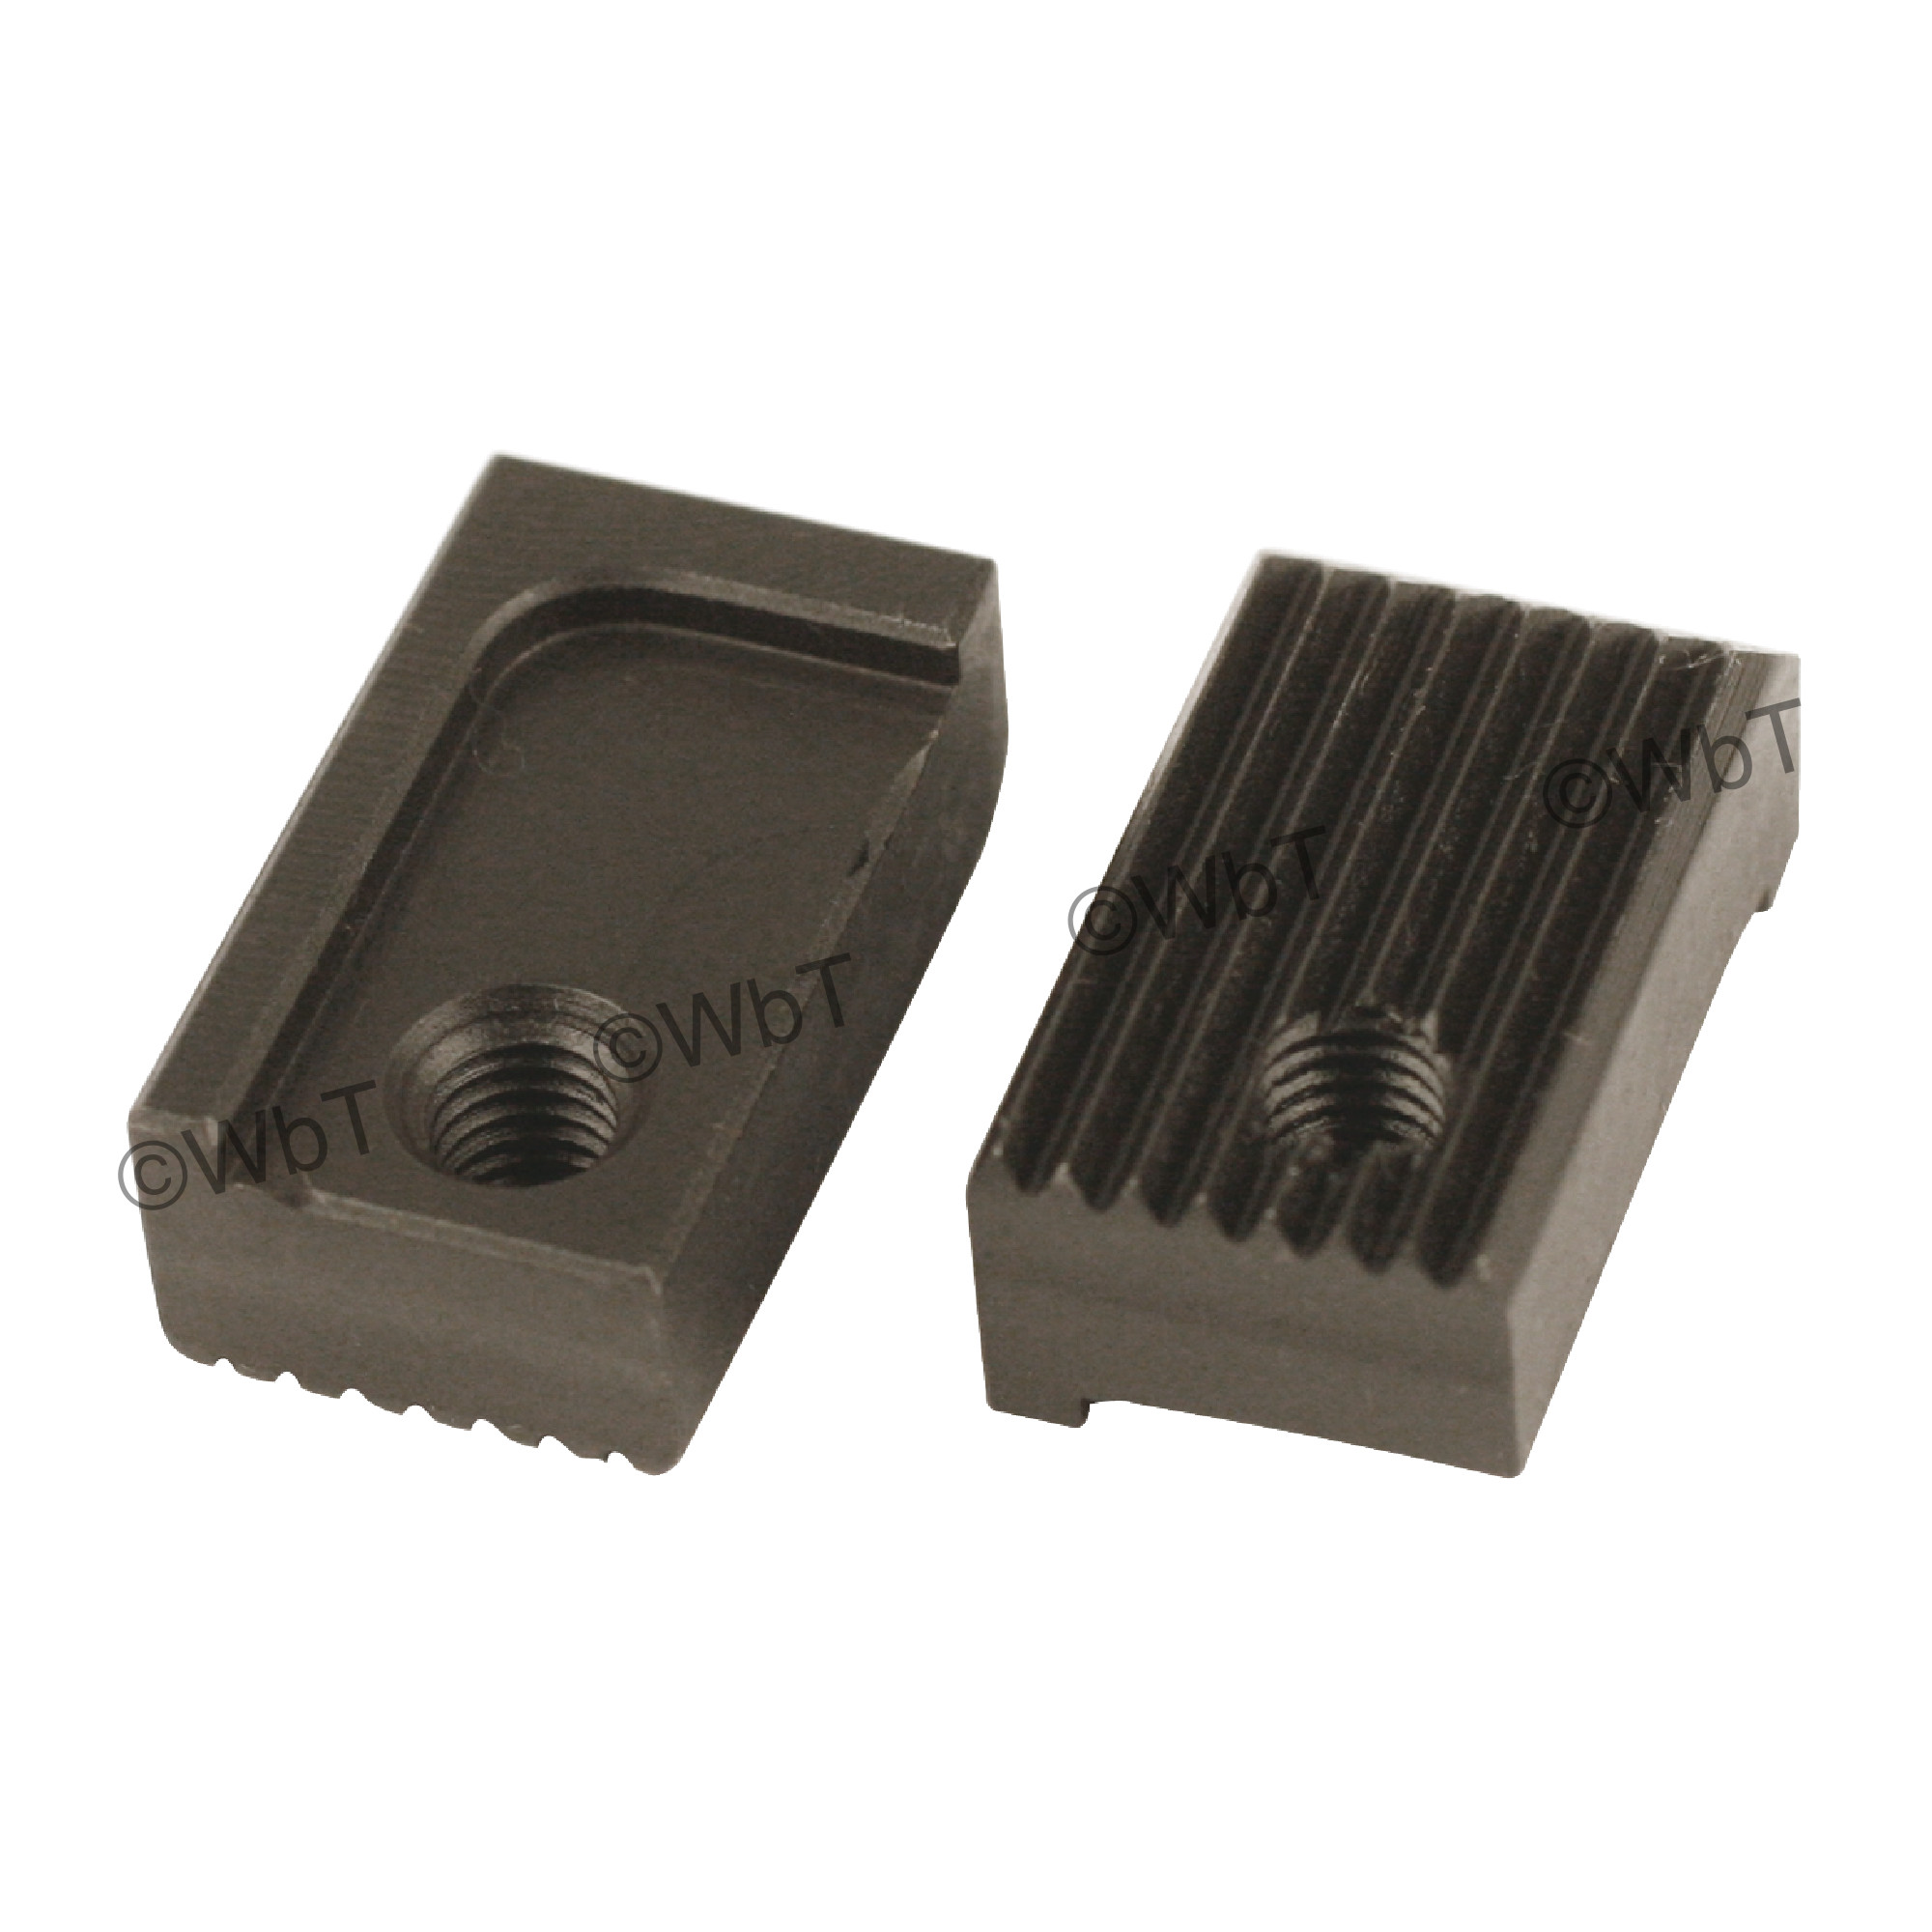 Compact CNC Bar Puller - Serrated Jaw Set